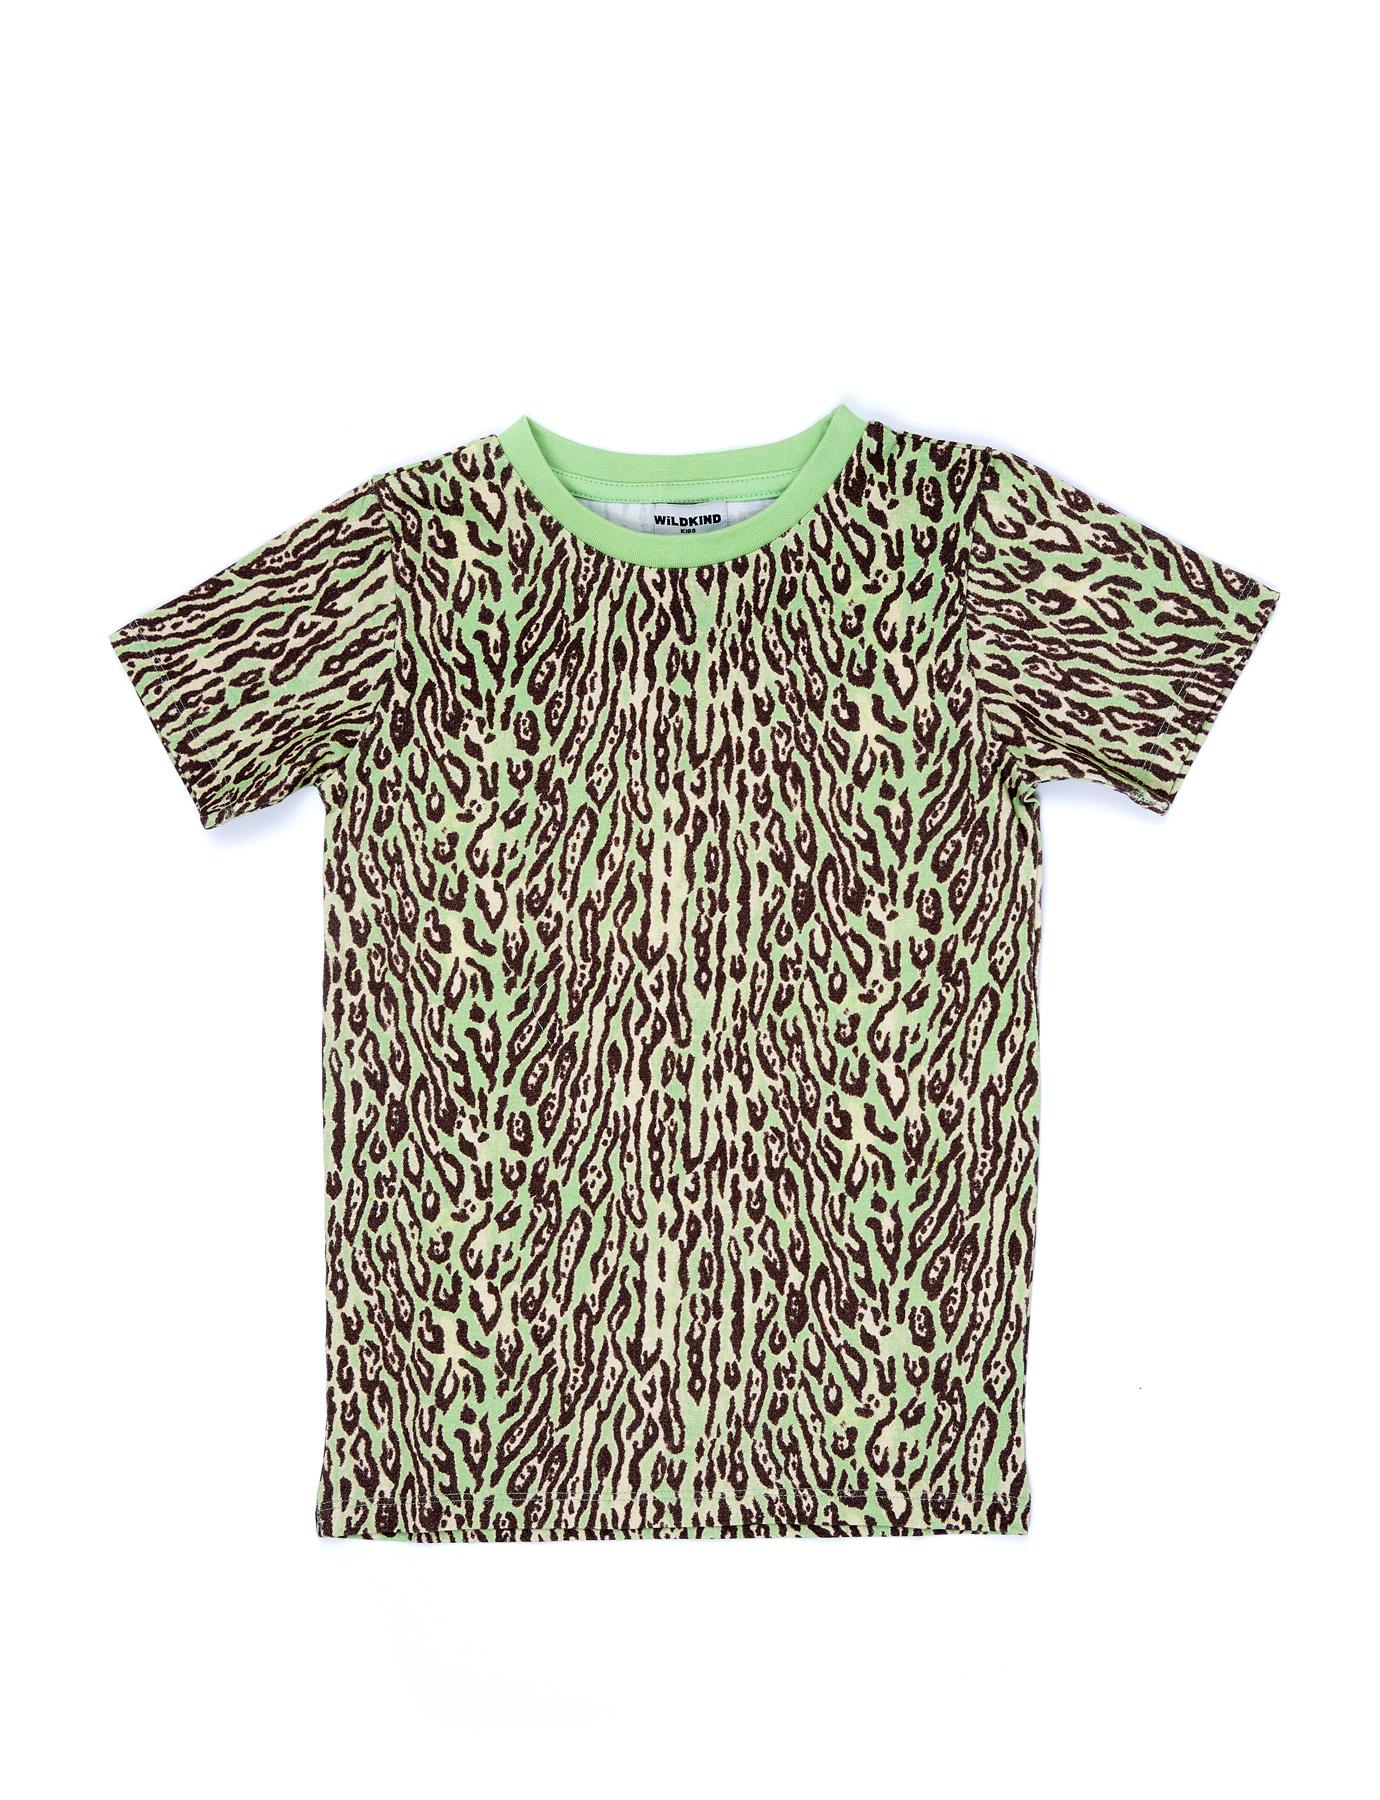 Lance_long_tee_leopard_green_44€.jpg